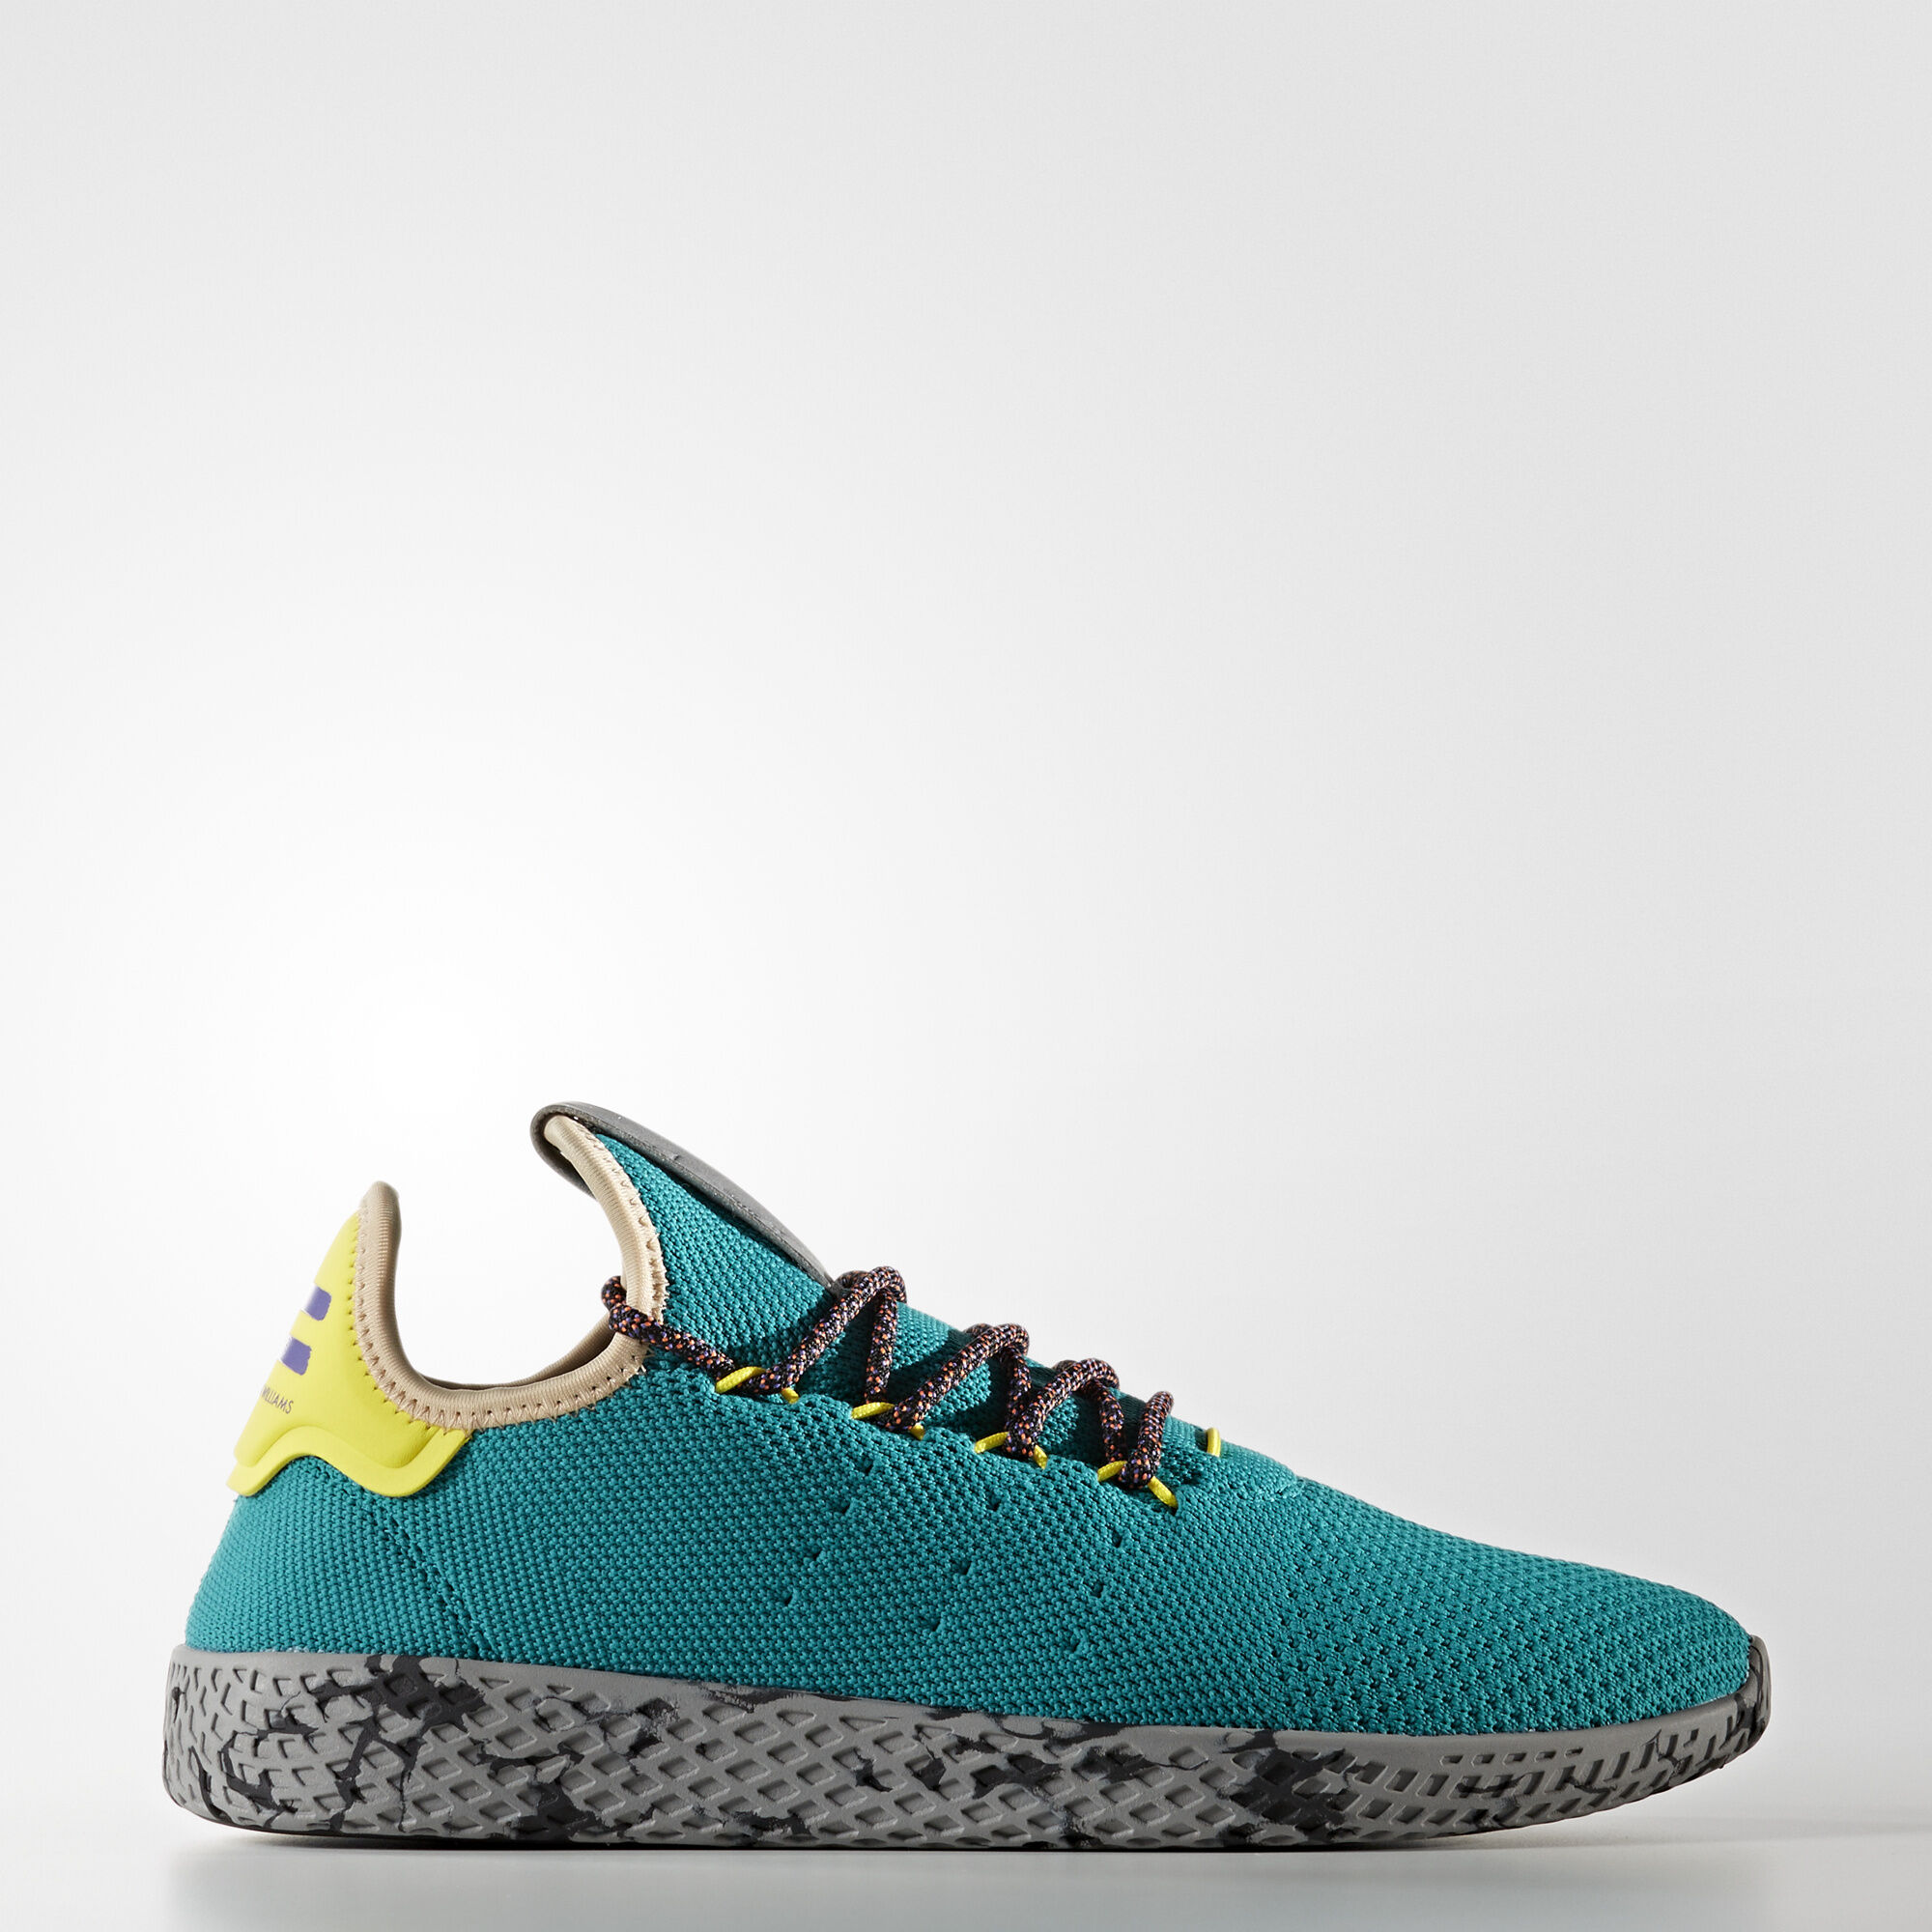 db7f98738caaf Pharrell Adidas Tennis Hu Multi Color Preview By Stadium - EpicGaming